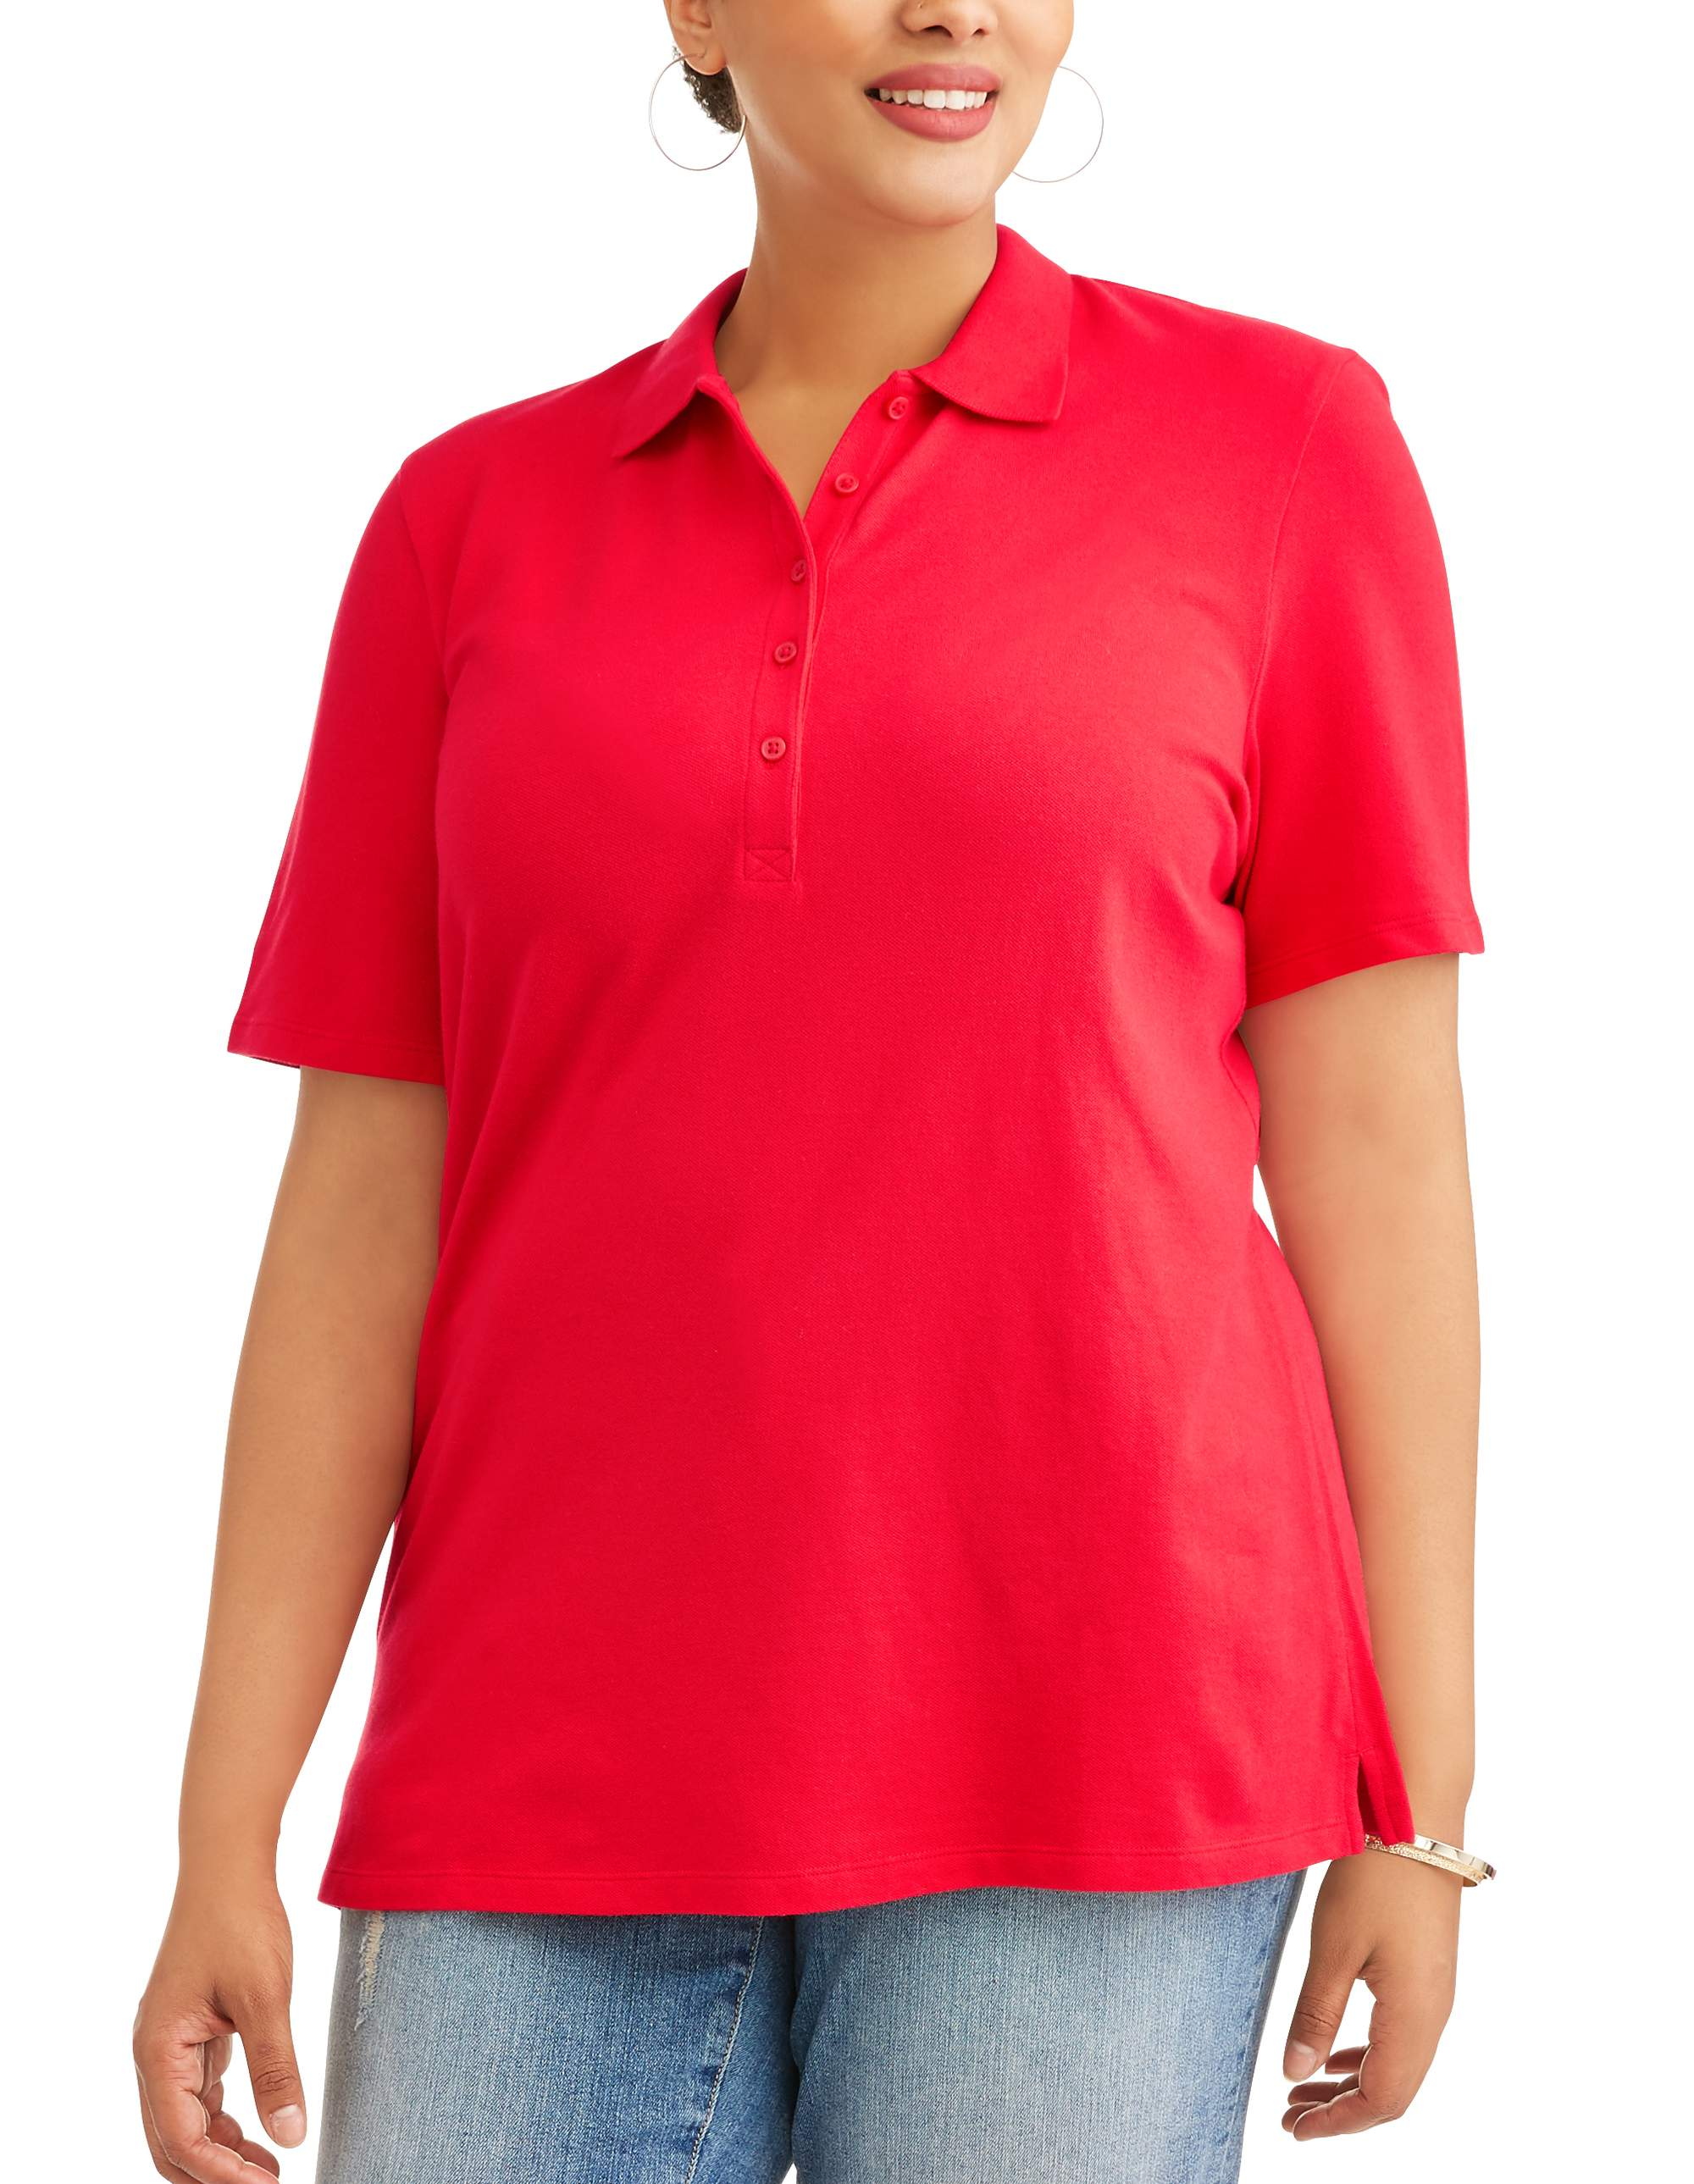 35cfd7f2f Long Sleeve Polo Shirts Walmart - DREAMWORKS